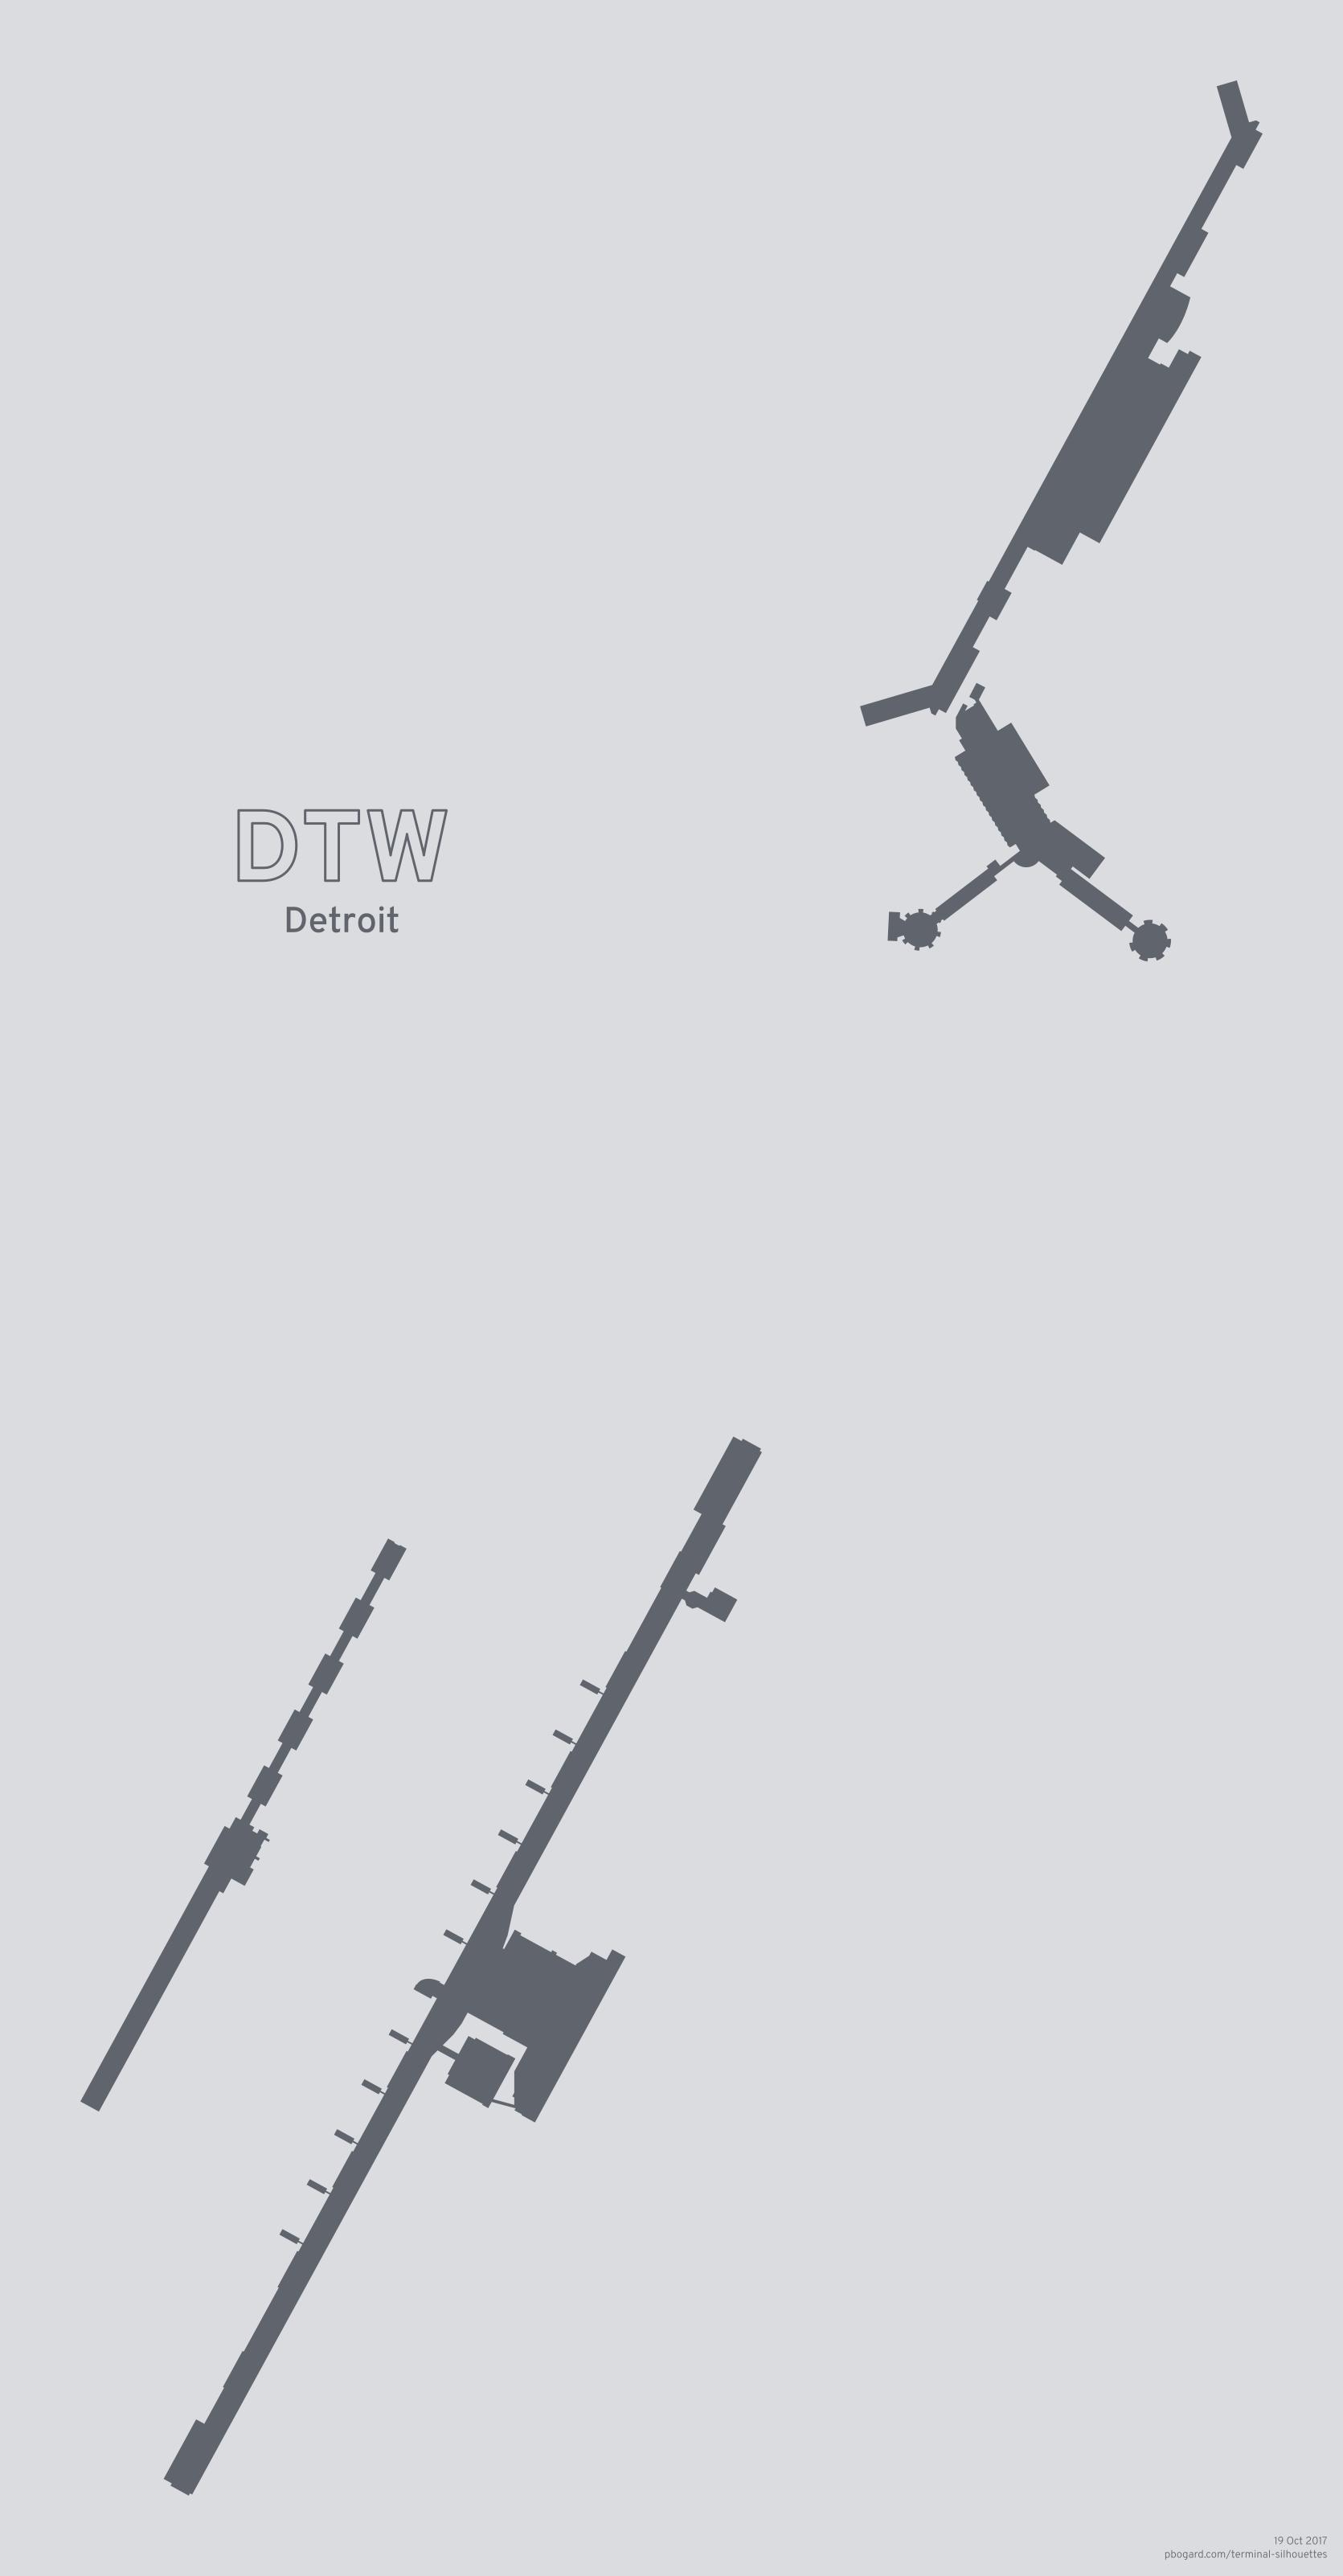 Terminal silhouette of DTW (Detroit)